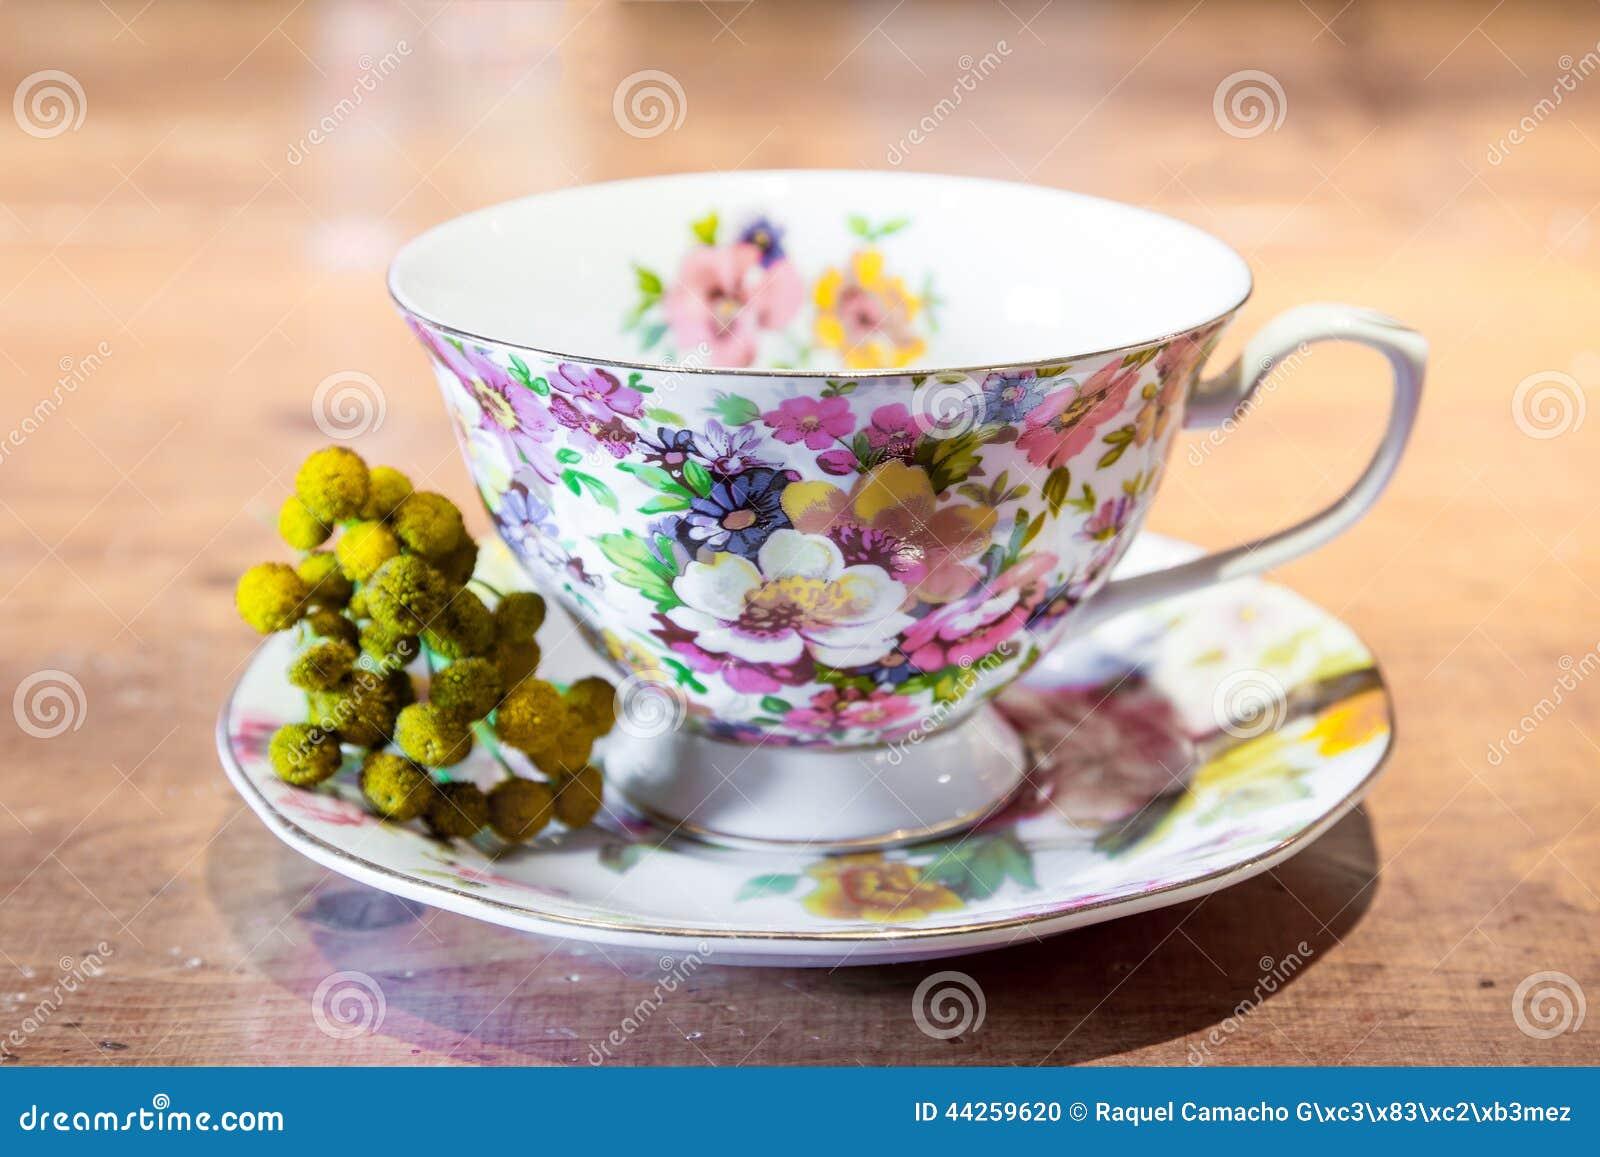 tasse de th de porcelaine photo stock image 44259620. Black Bedroom Furniture Sets. Home Design Ideas